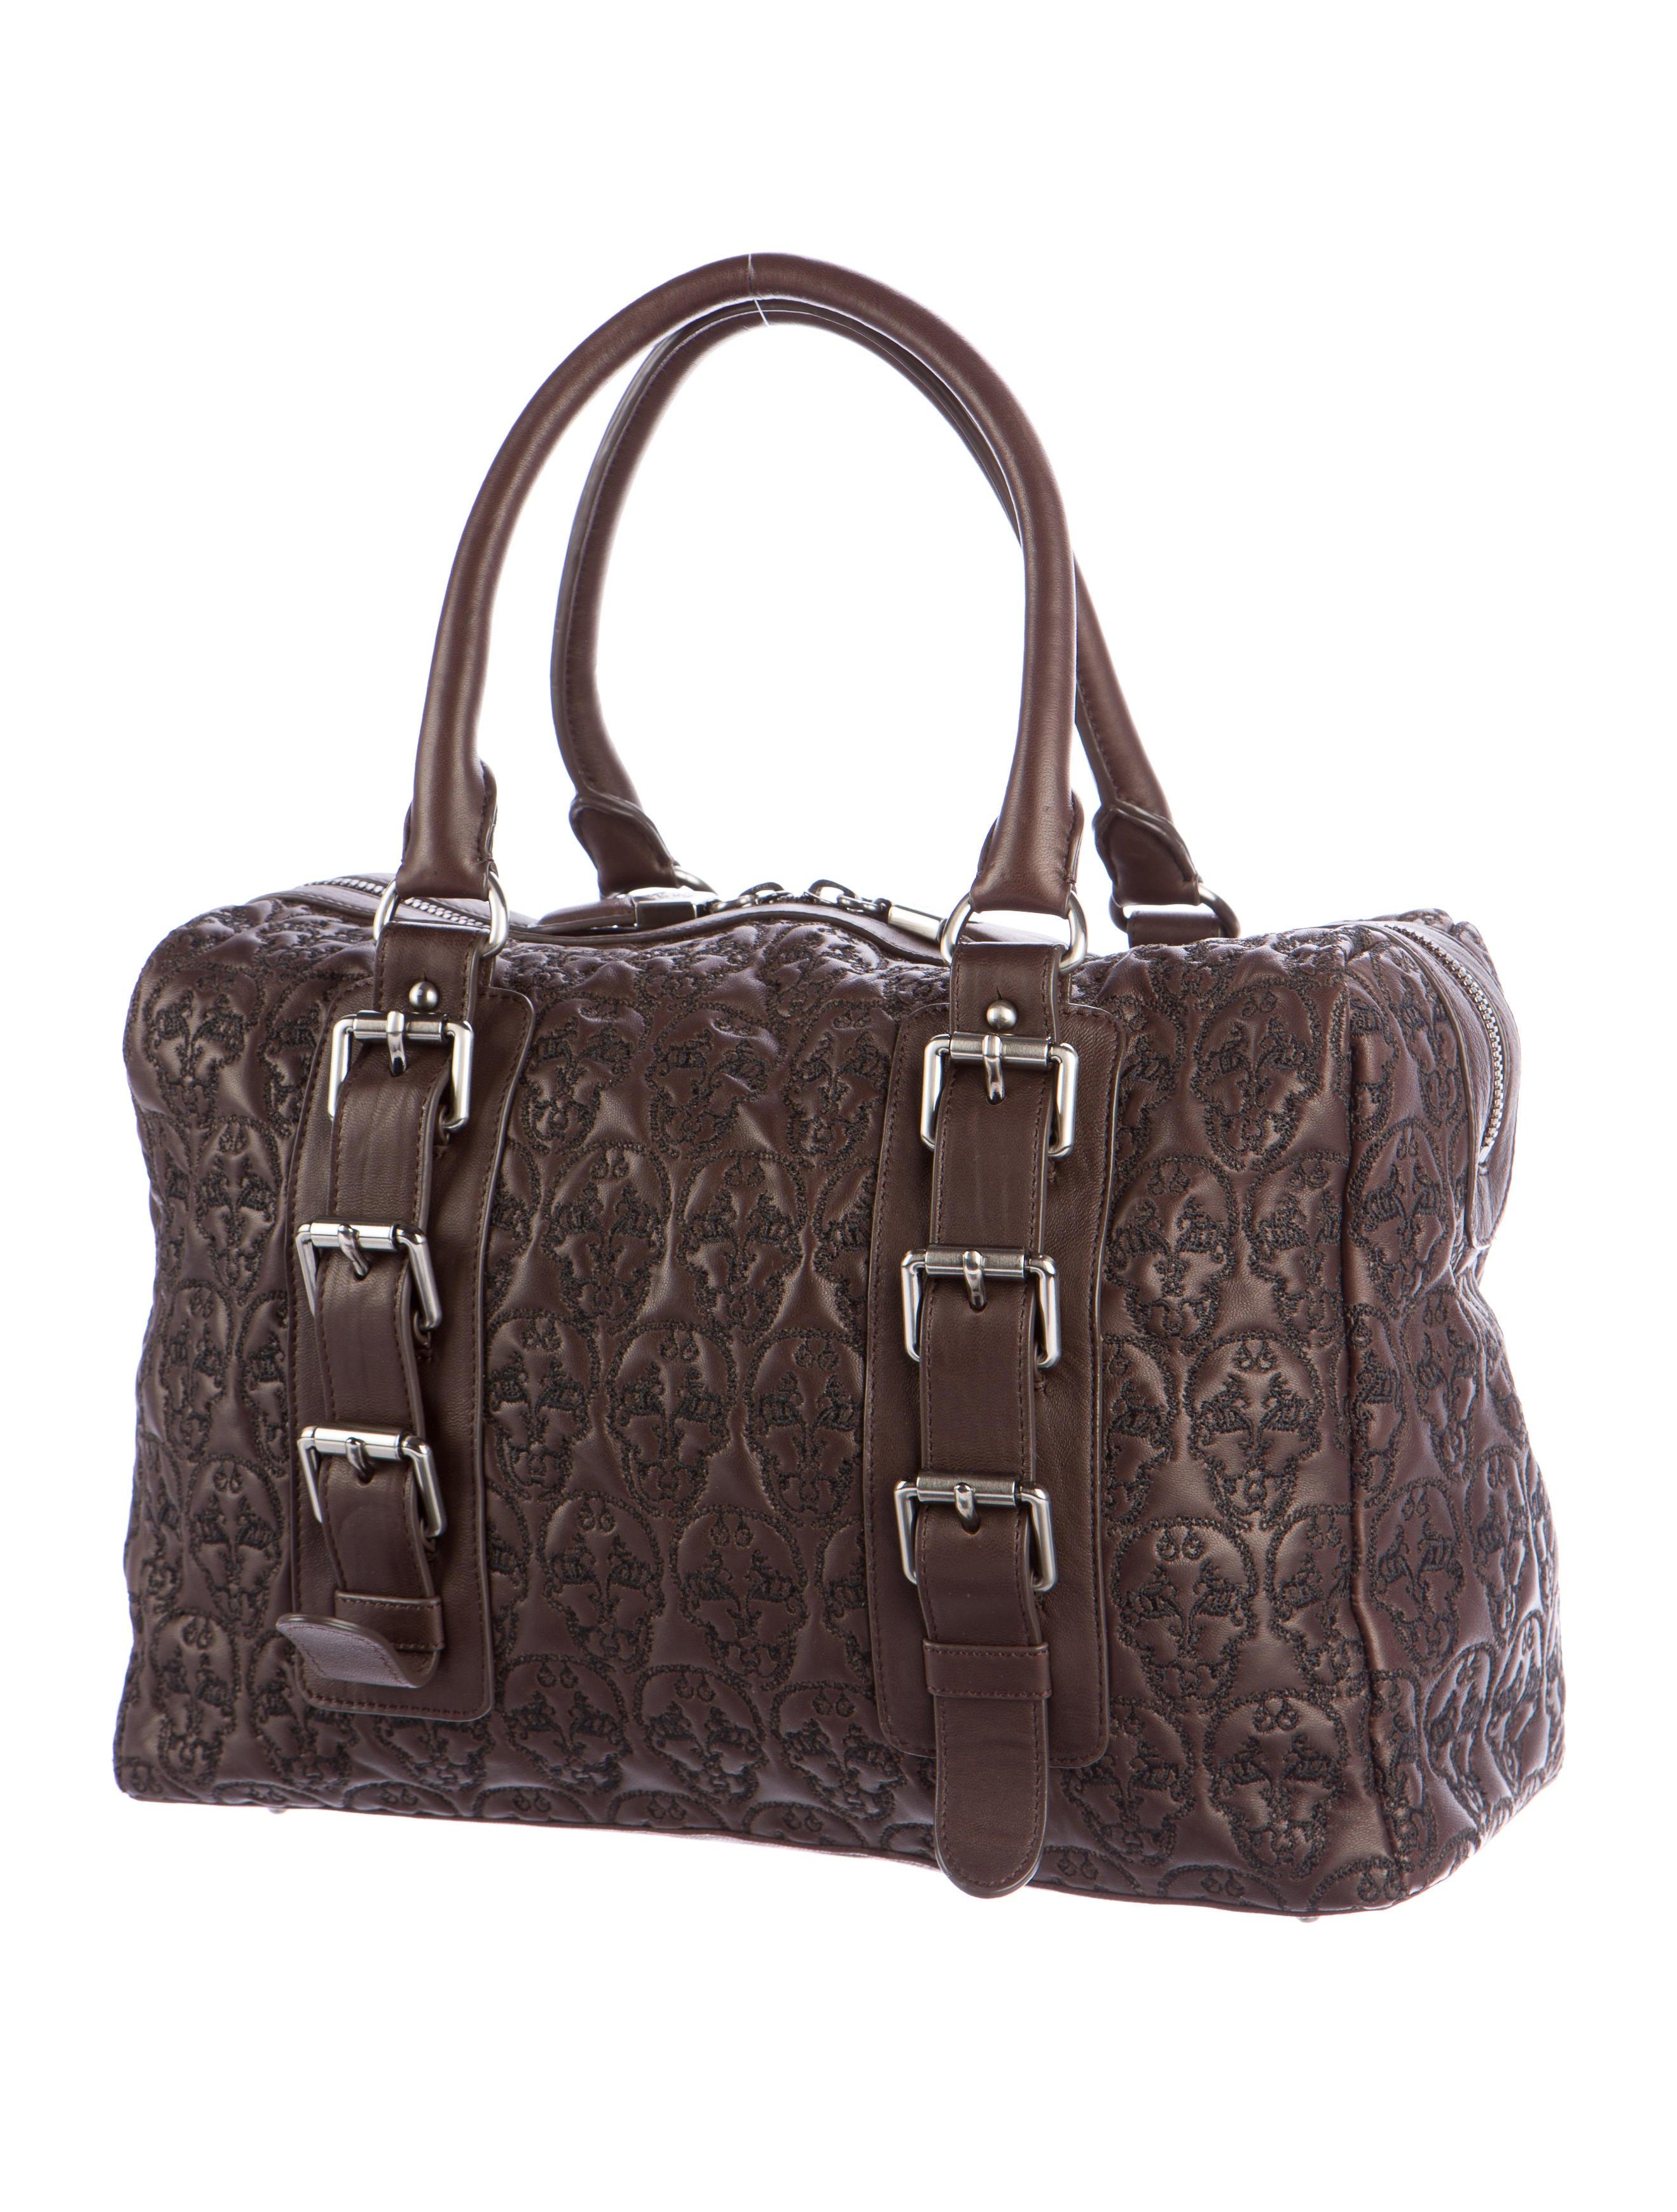 9070106662cf Thomas Wylde Skull-Embroidered Leather Handle Bag - Handbags ...